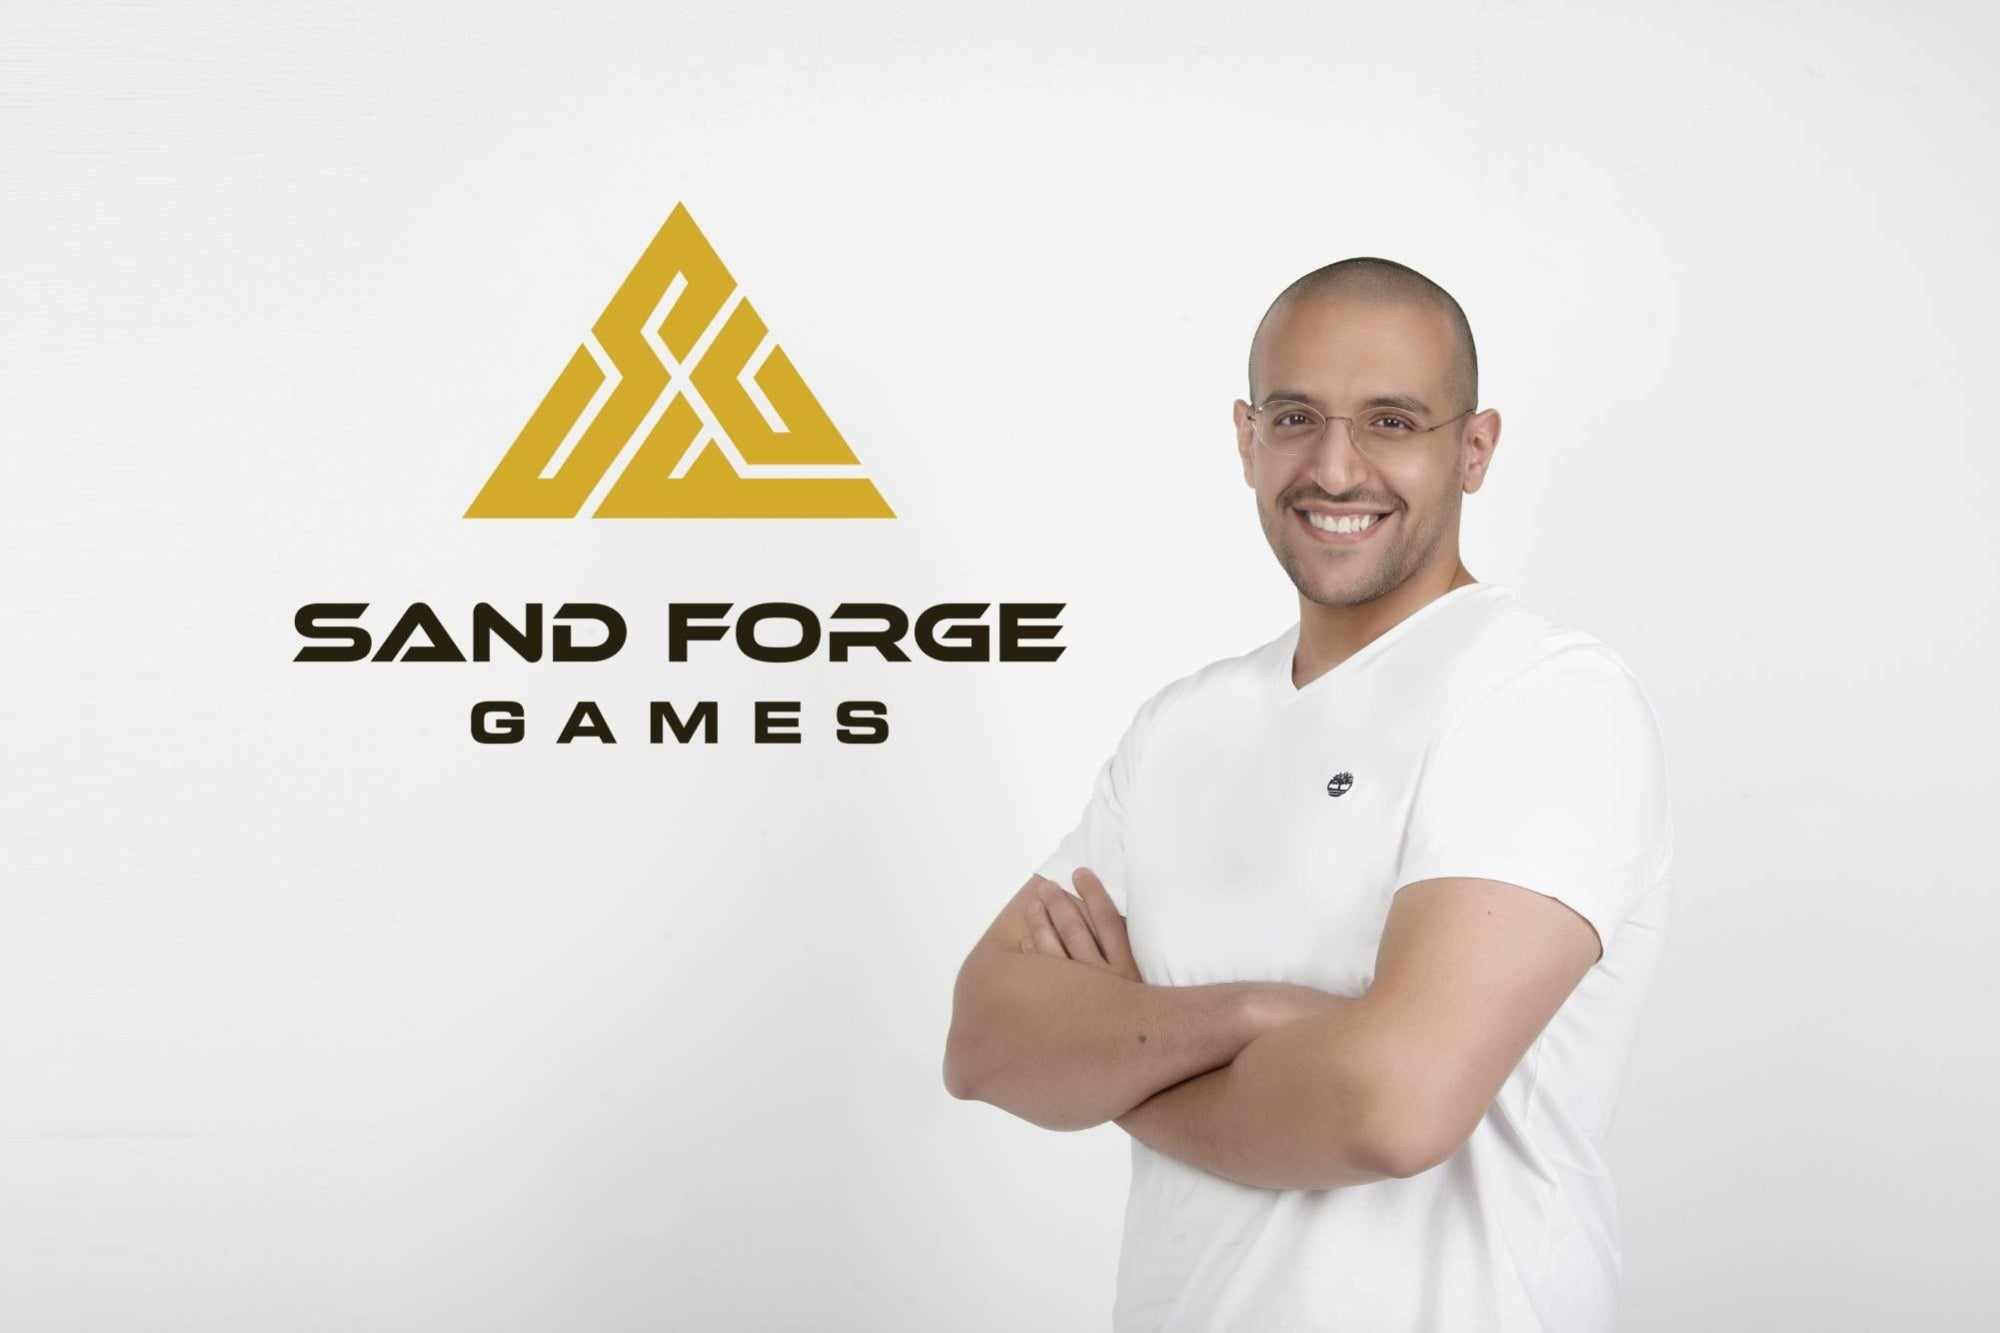 kuwait games entrepreneur game sand